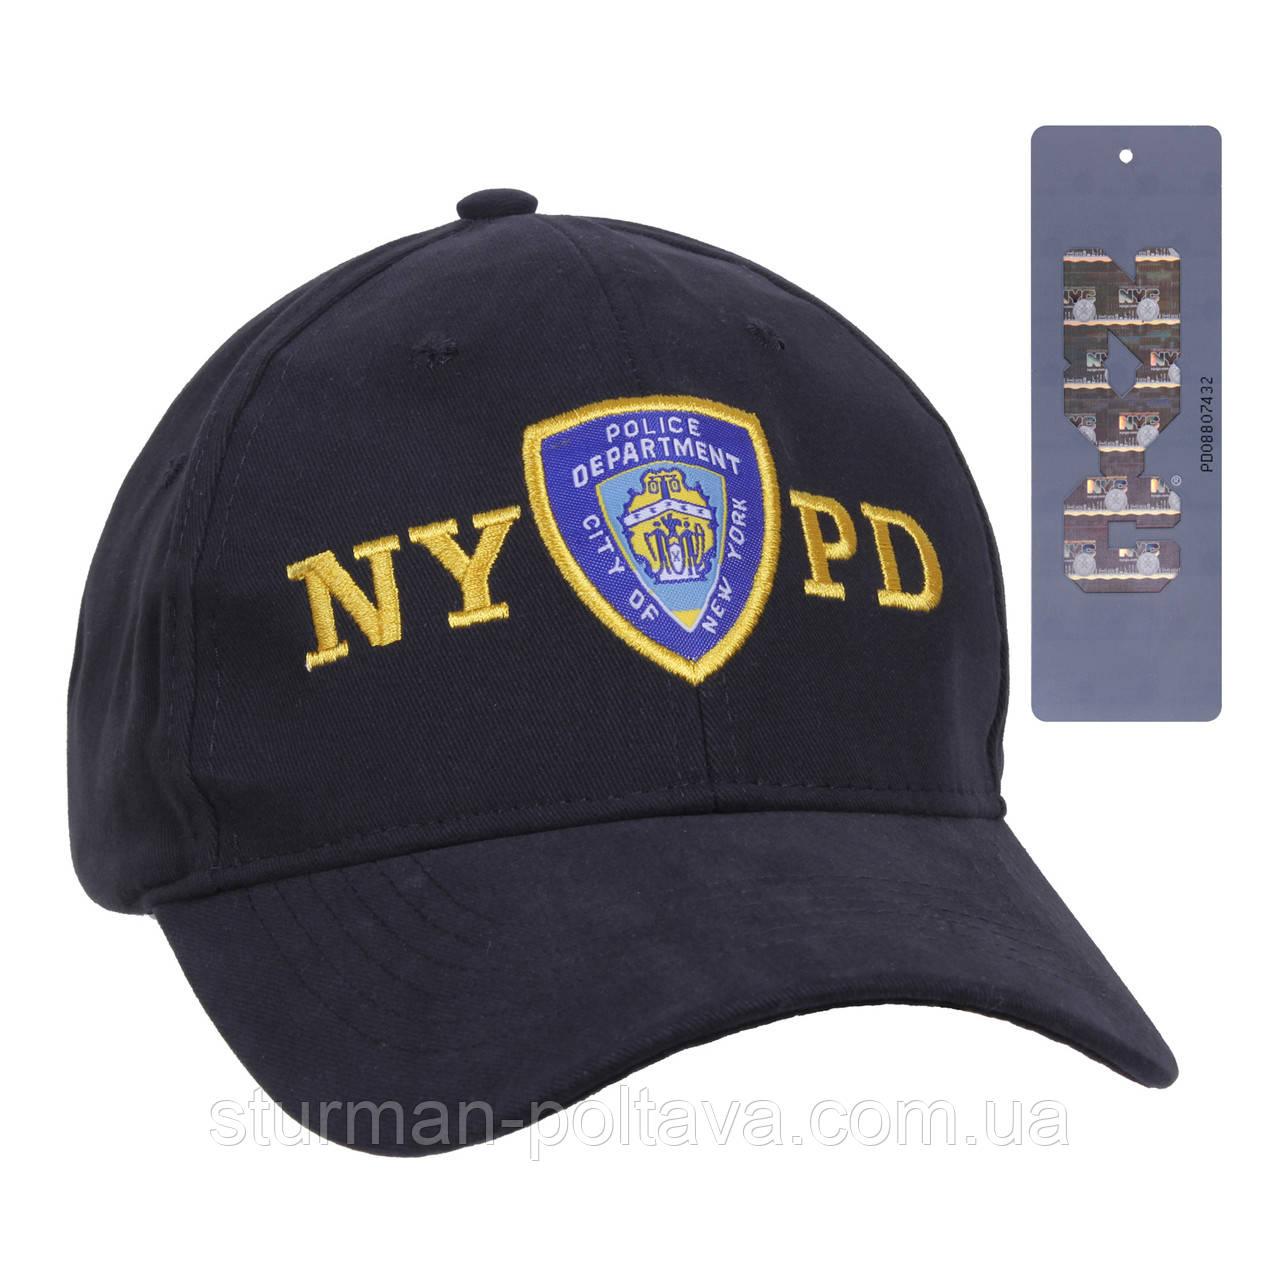 Бейсболка полиция   ''NYPD''  Rotcho с шевроном   США